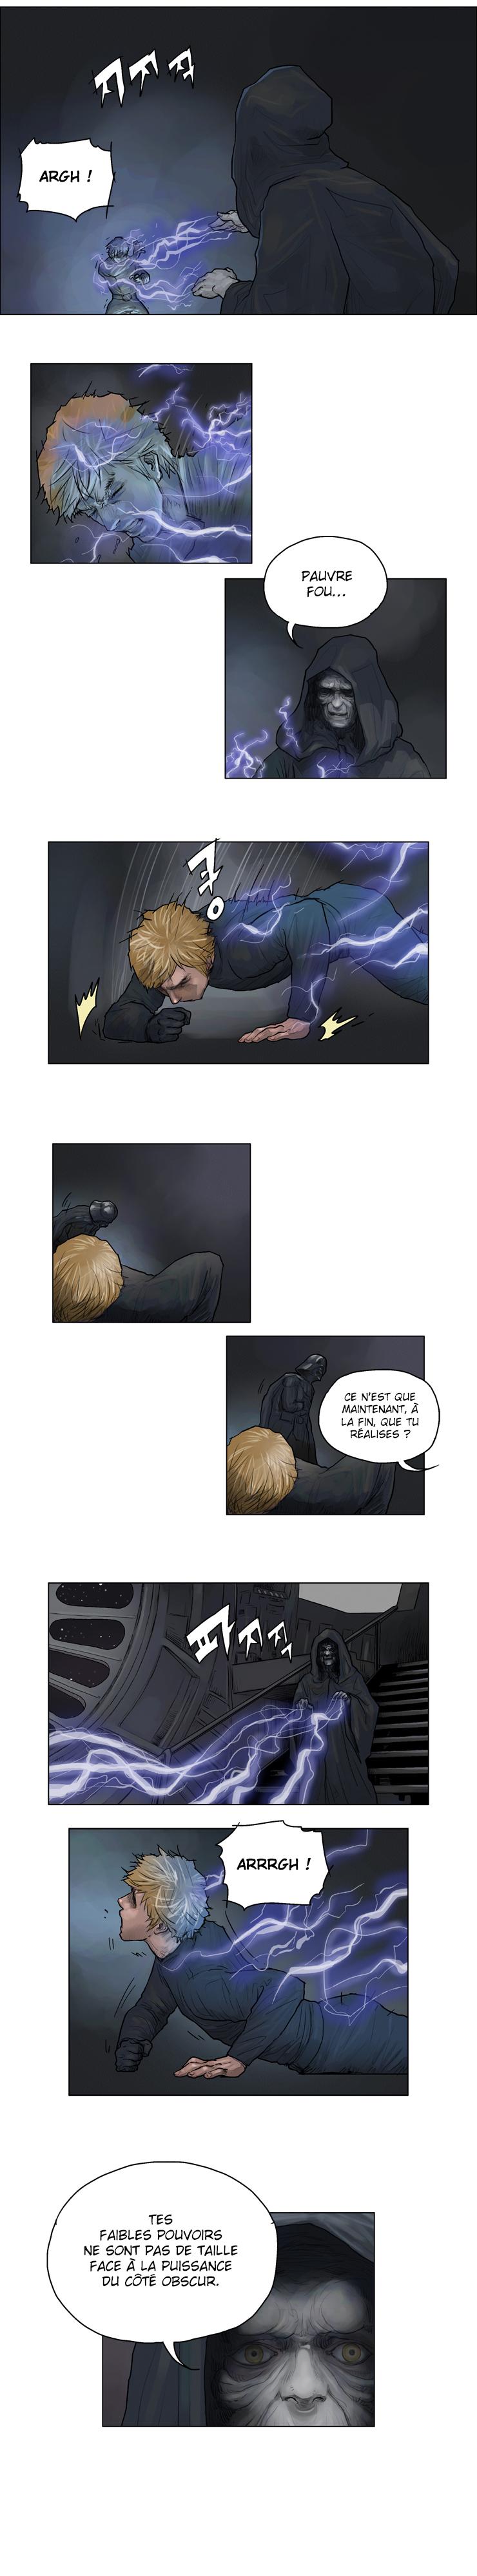 https://nine.mangadogs.com/fr_manga/pic1/13/1101/47948/StarWars40VF_1_236.jpg Page 2